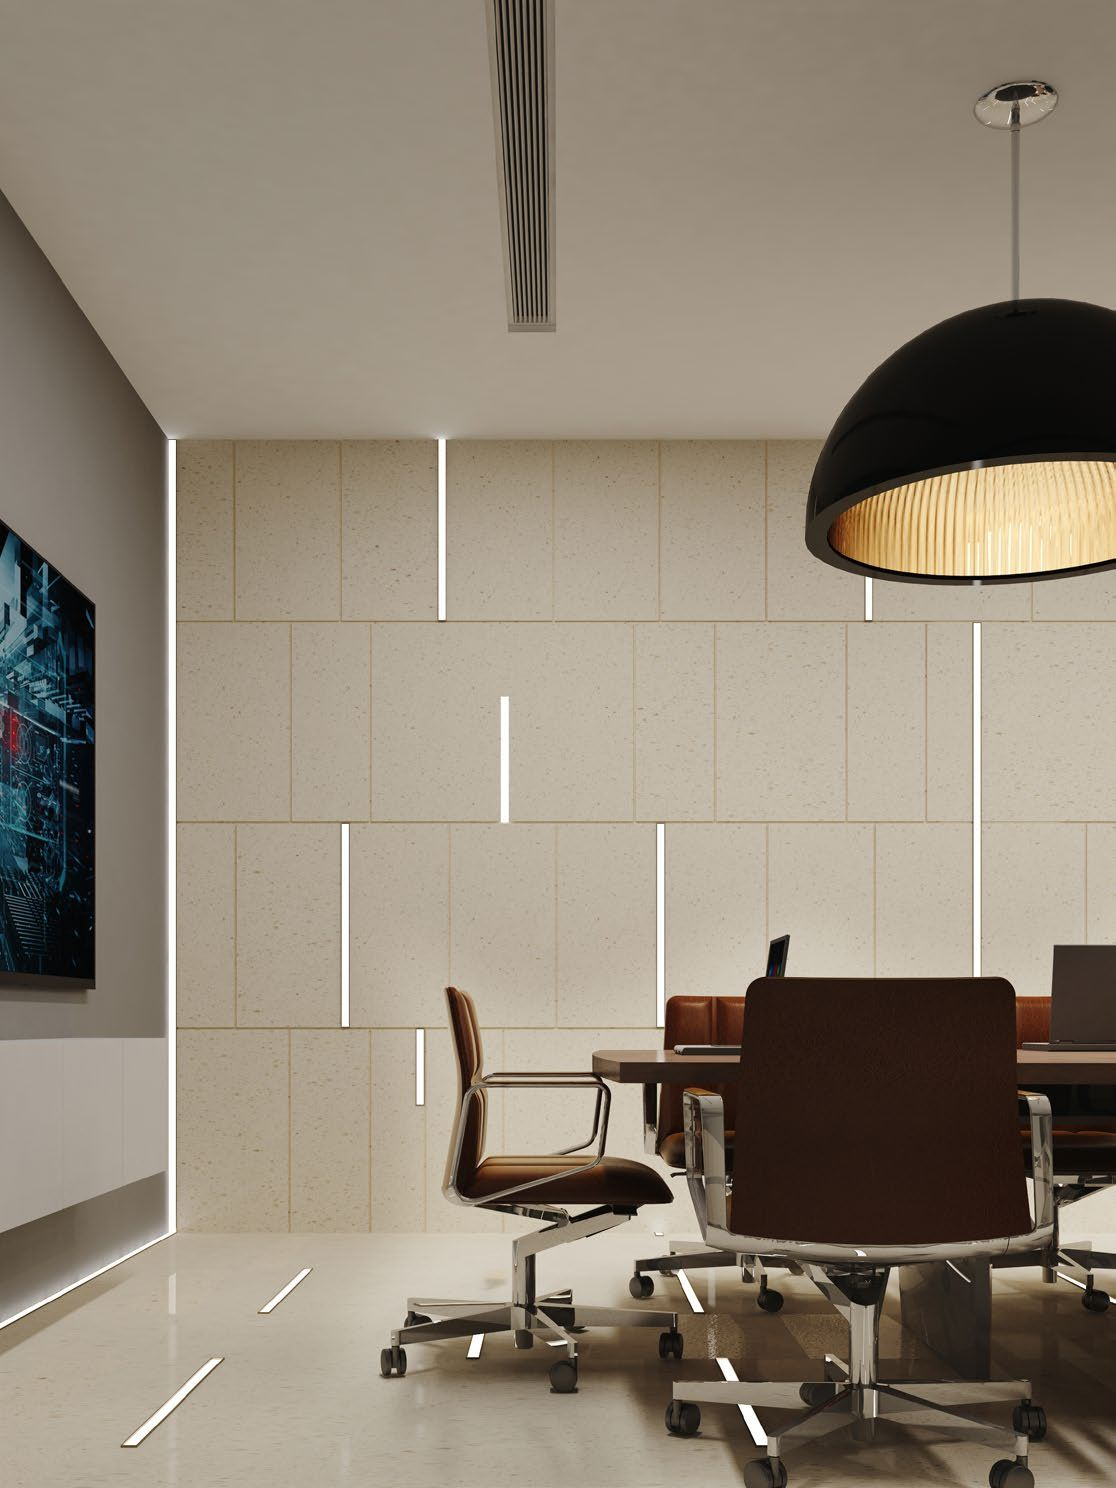 Minimalist design office ideas office lighting wall lights